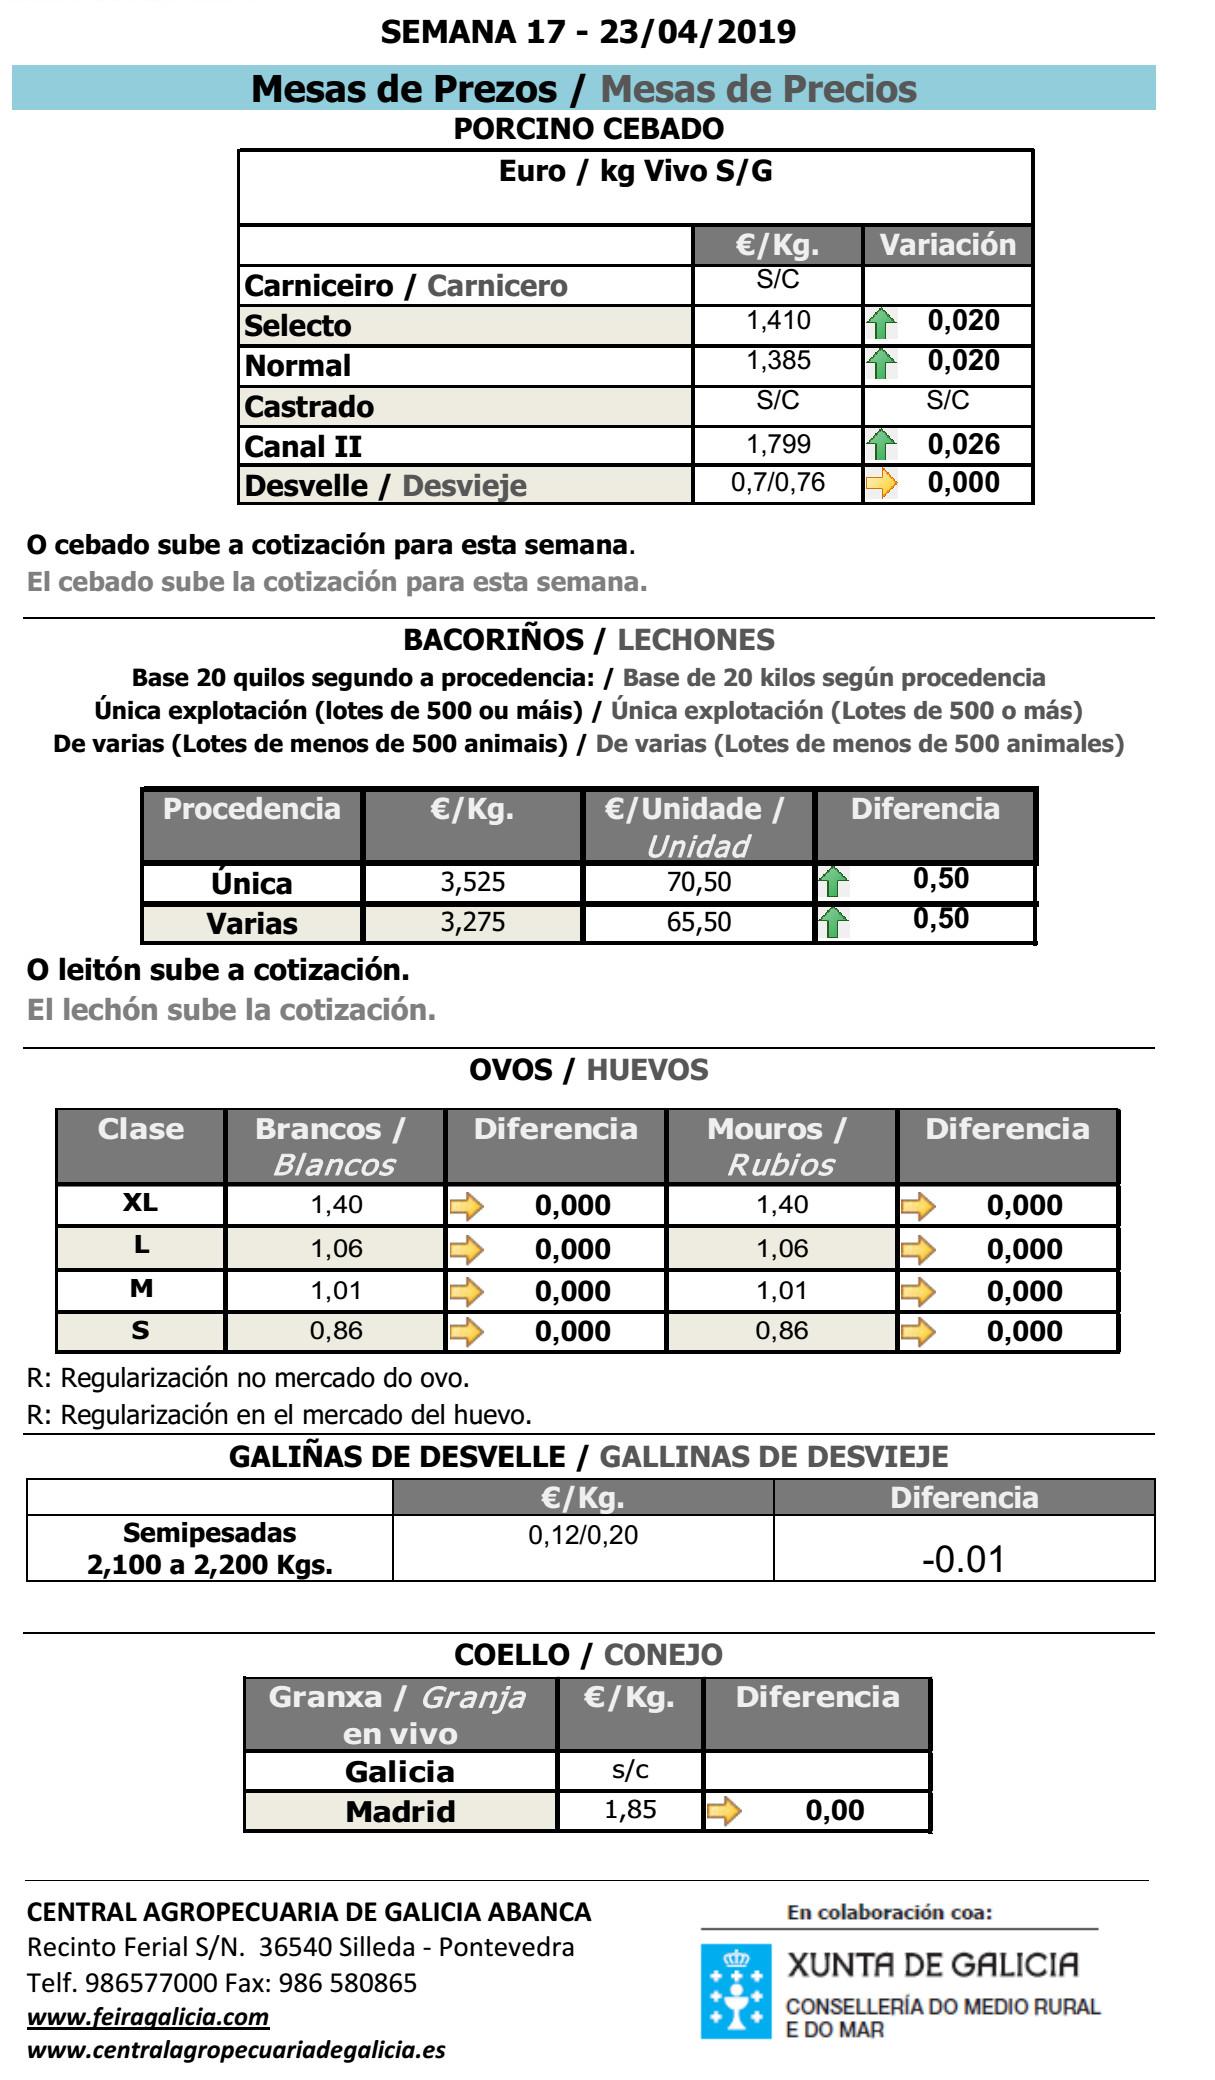 SILLEDA_19_04_05_porcino